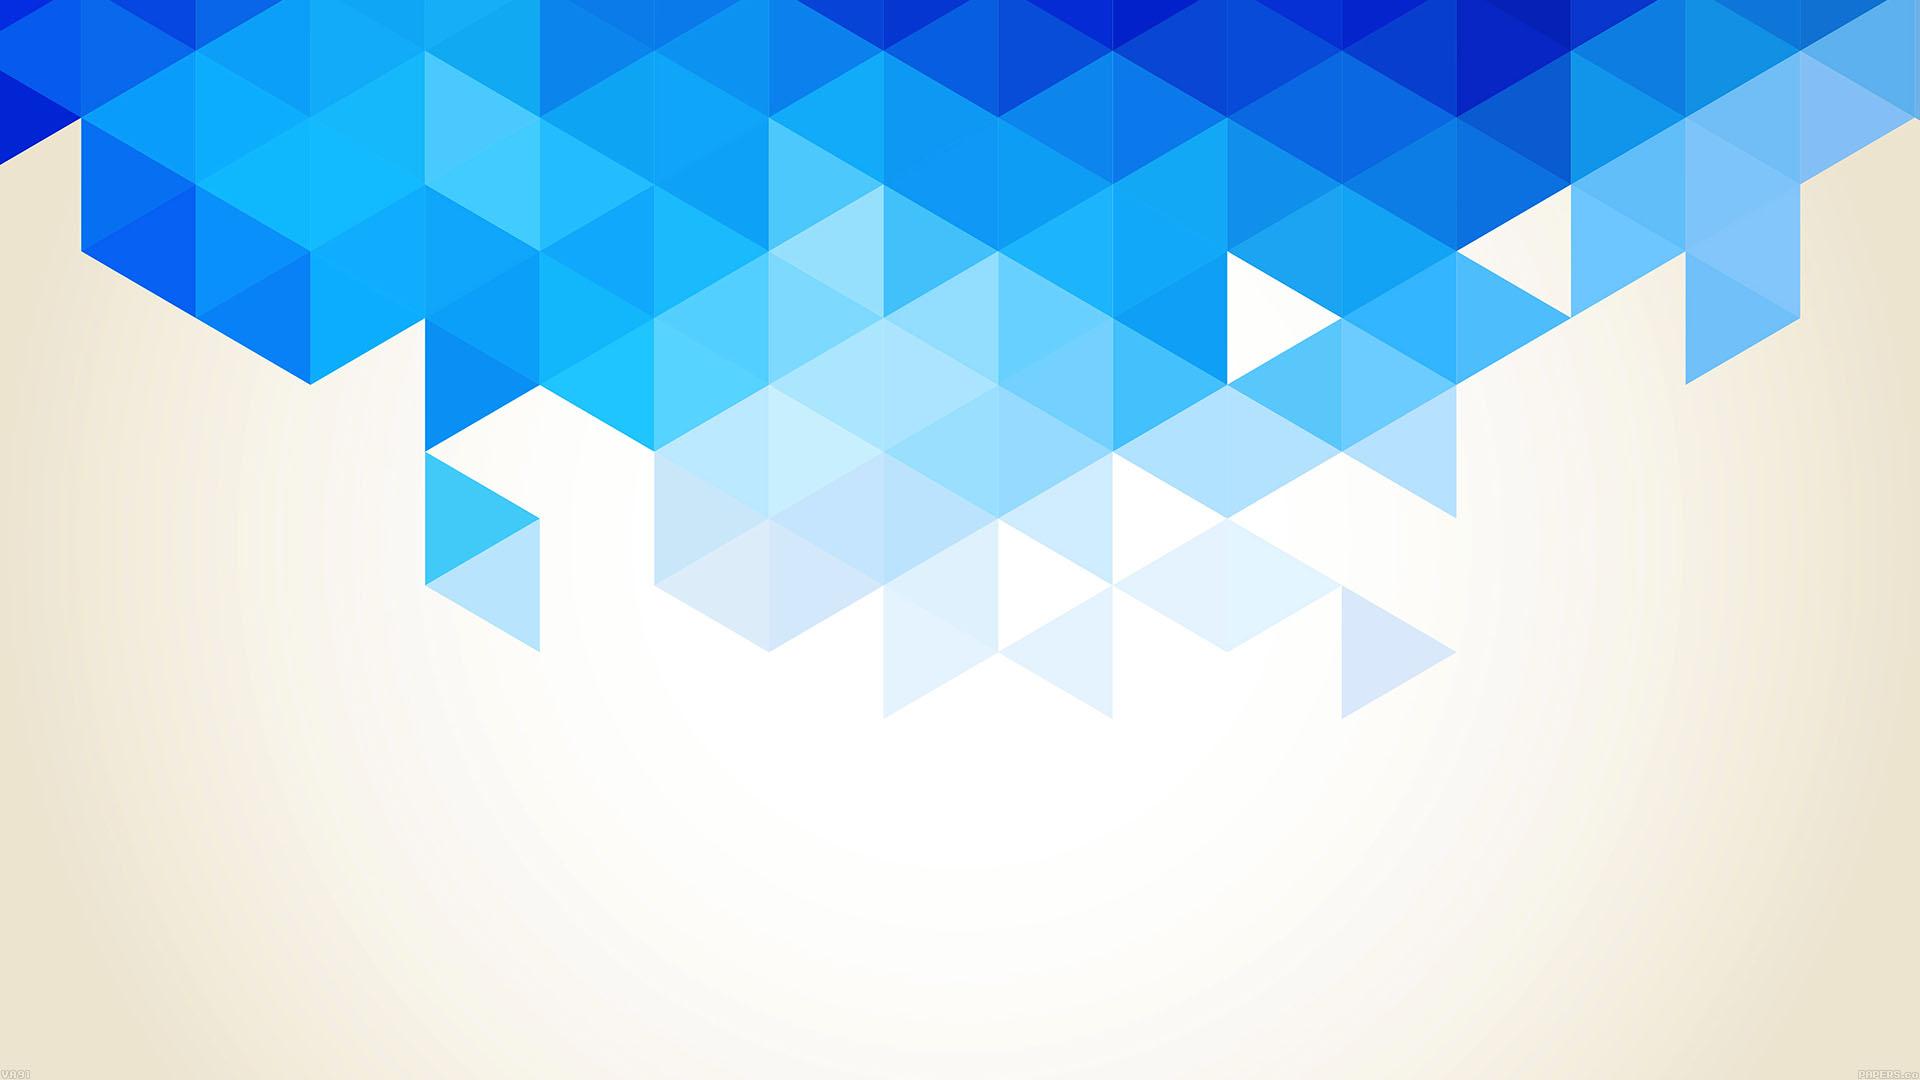 va91-wallpaper-triangle-fall-blue-pattern-wallpaper